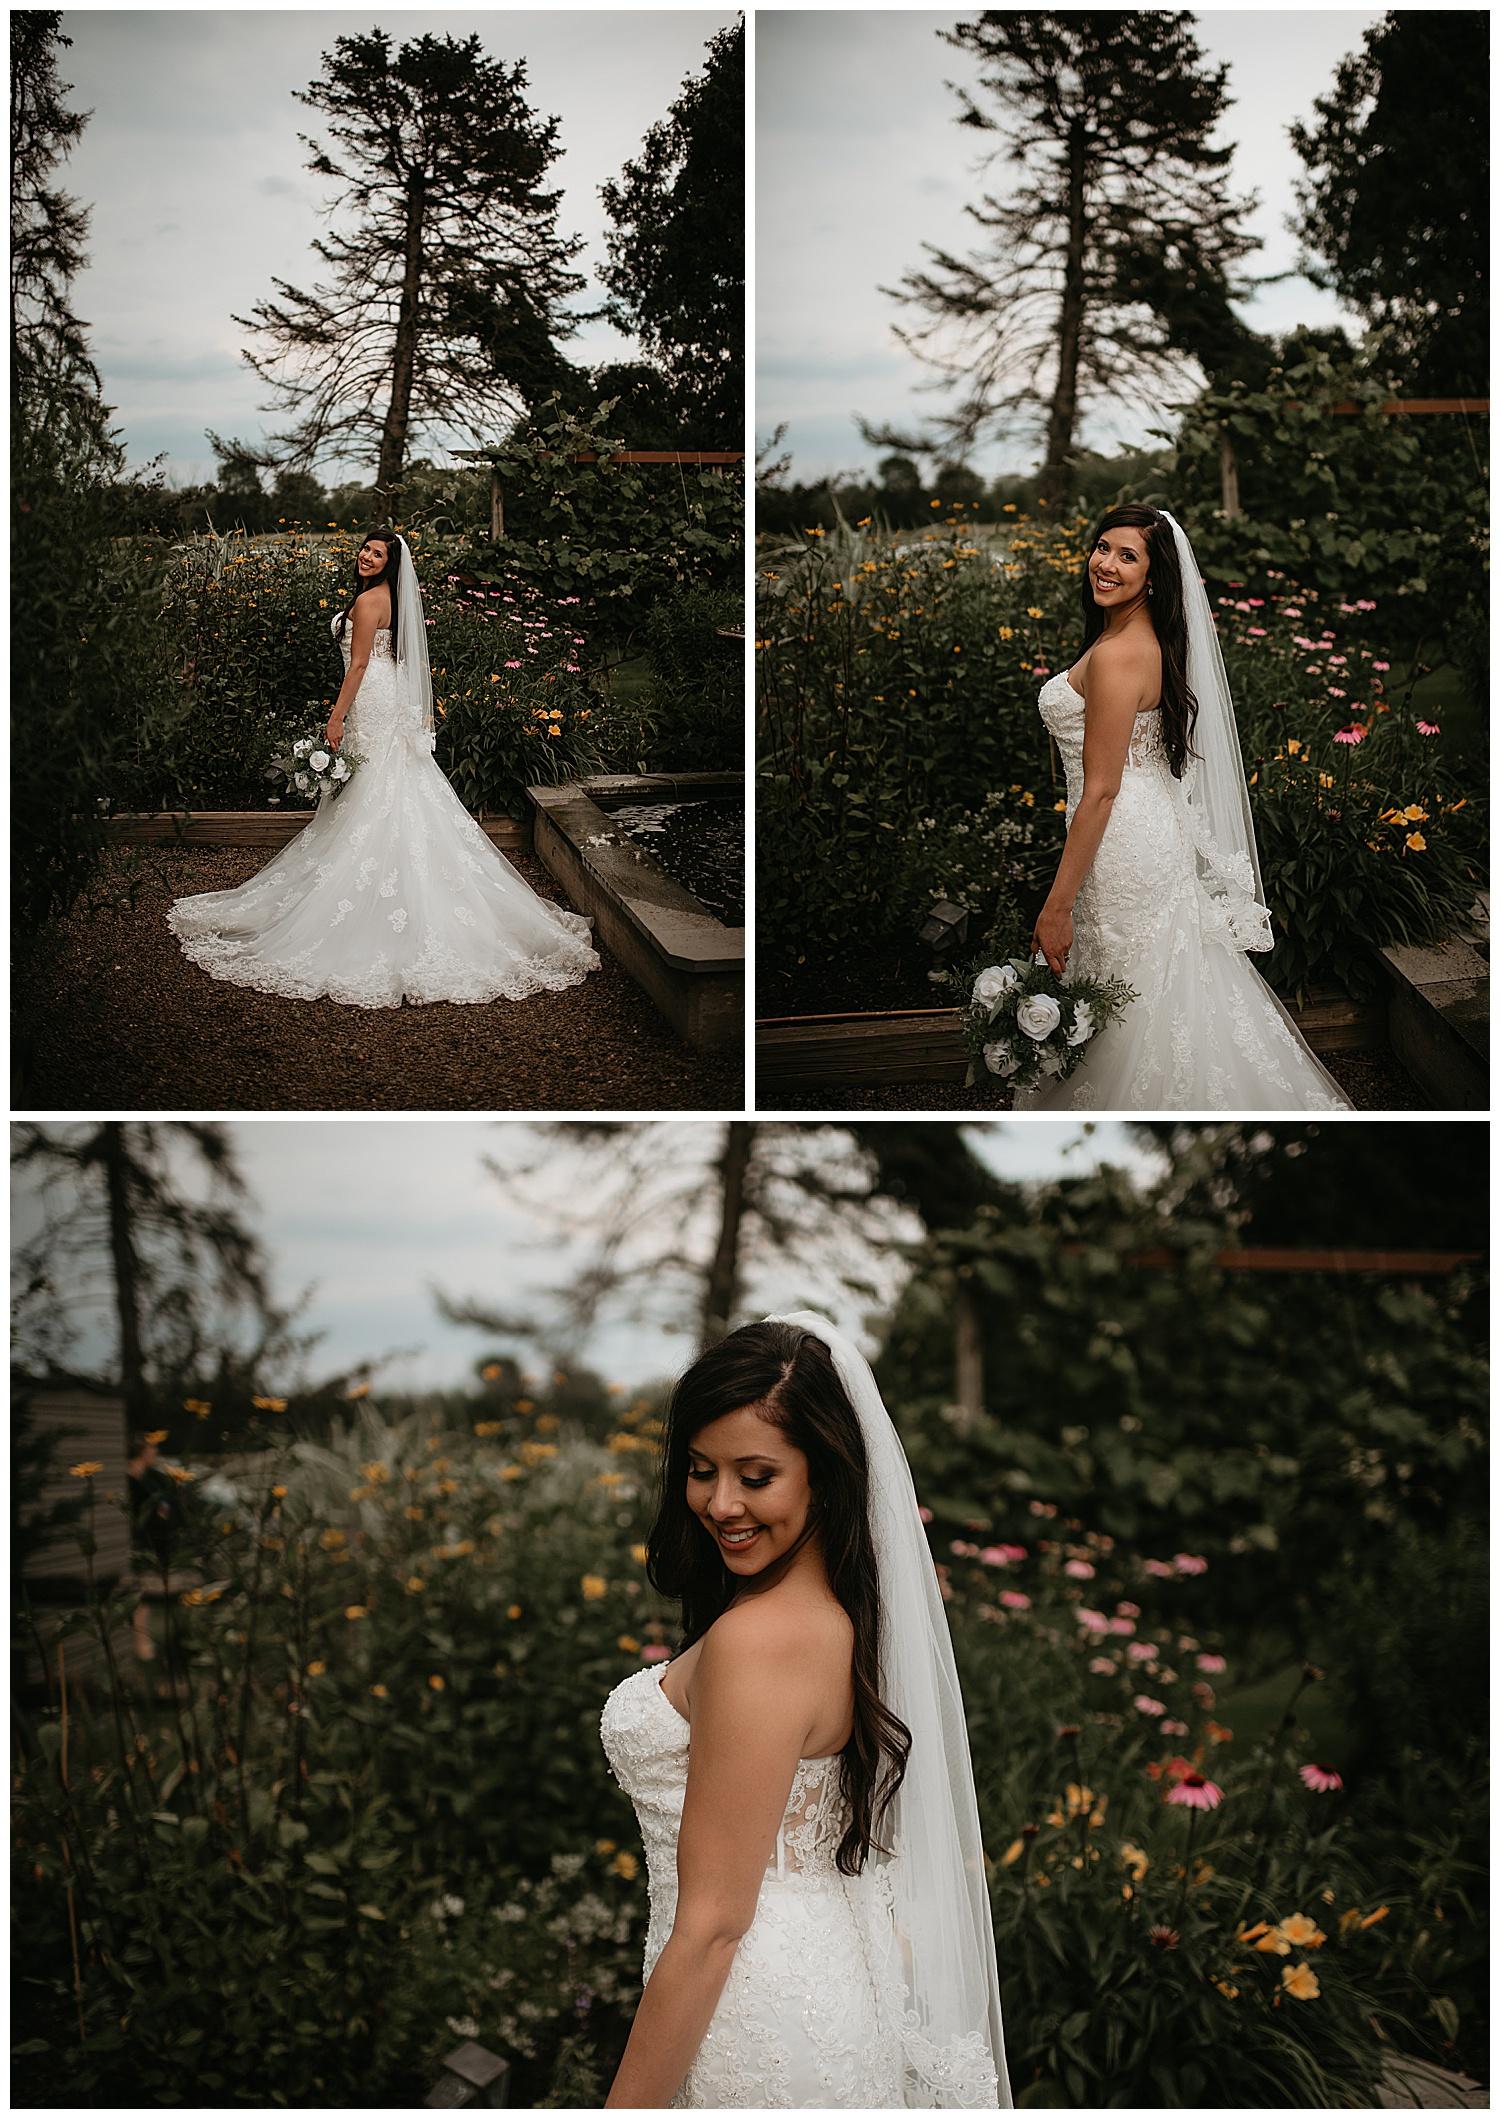 NEPA-Bloomsburg-Wedding-Photographer-at-The-Barn-at-Boones-Dam-Bloomsburg-PA_0052.jpg